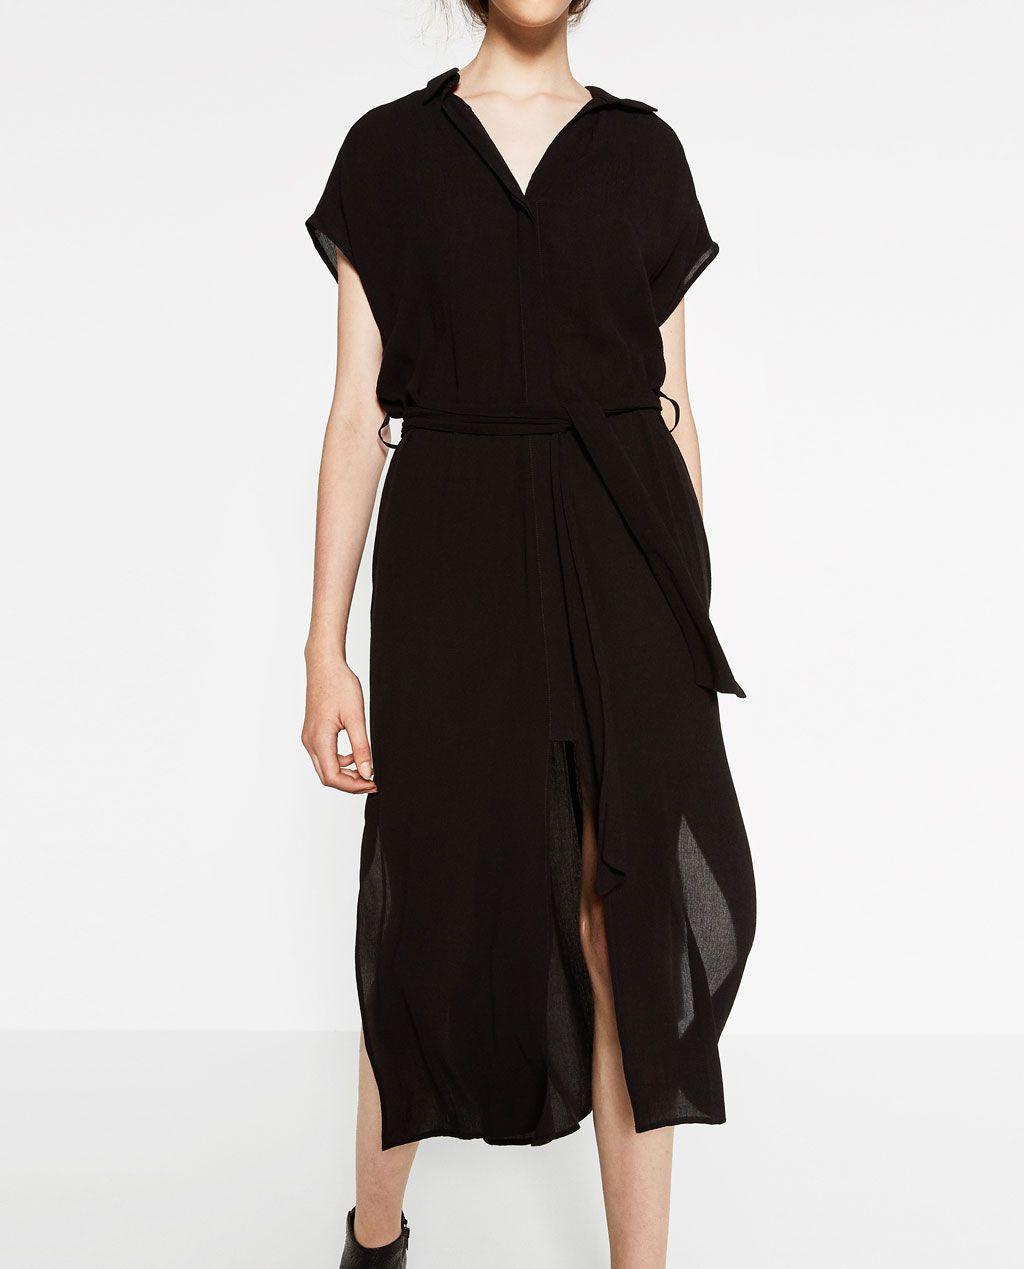 LONG TUNIC WITH SLITS-DRESSES-WOMAN | ZARA United States ...